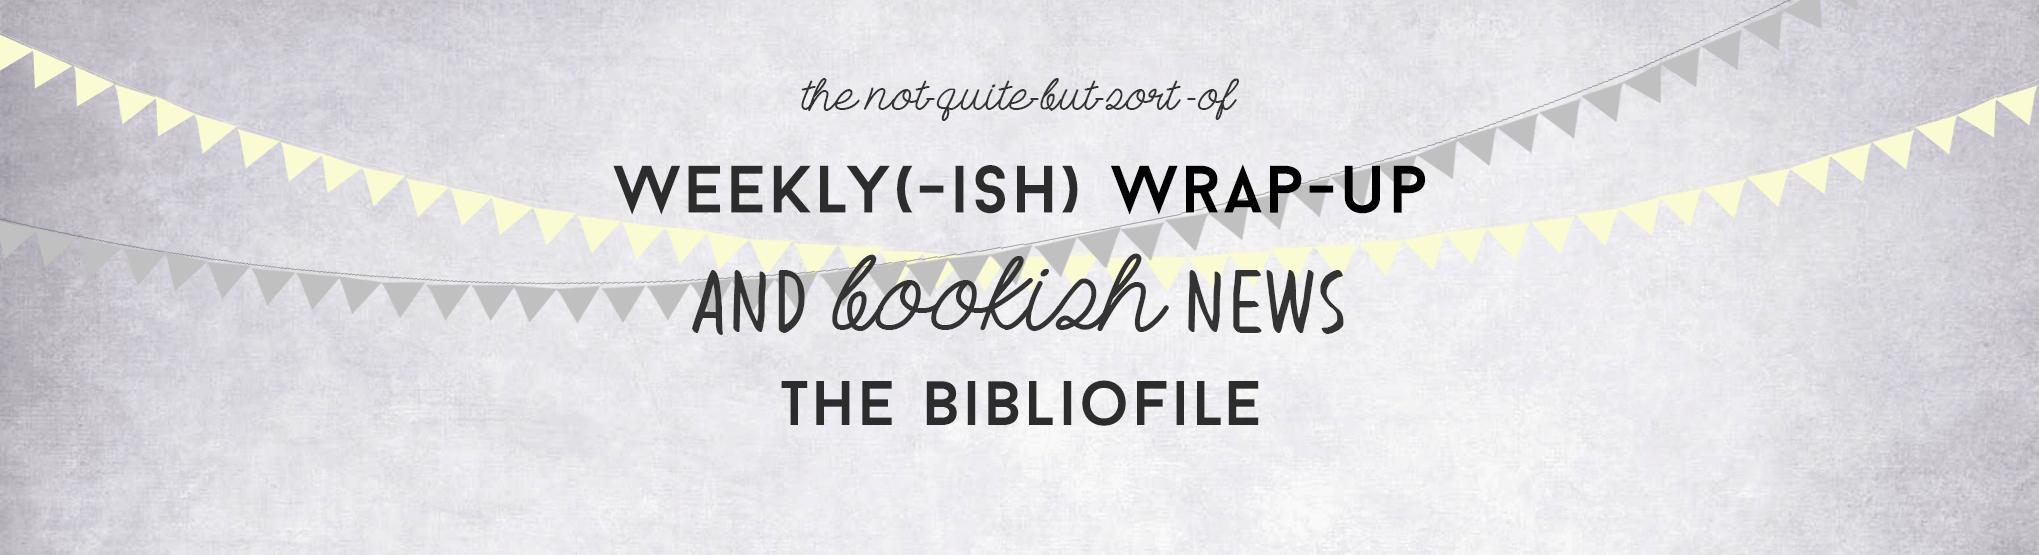 weeklywrapup-bannerv2